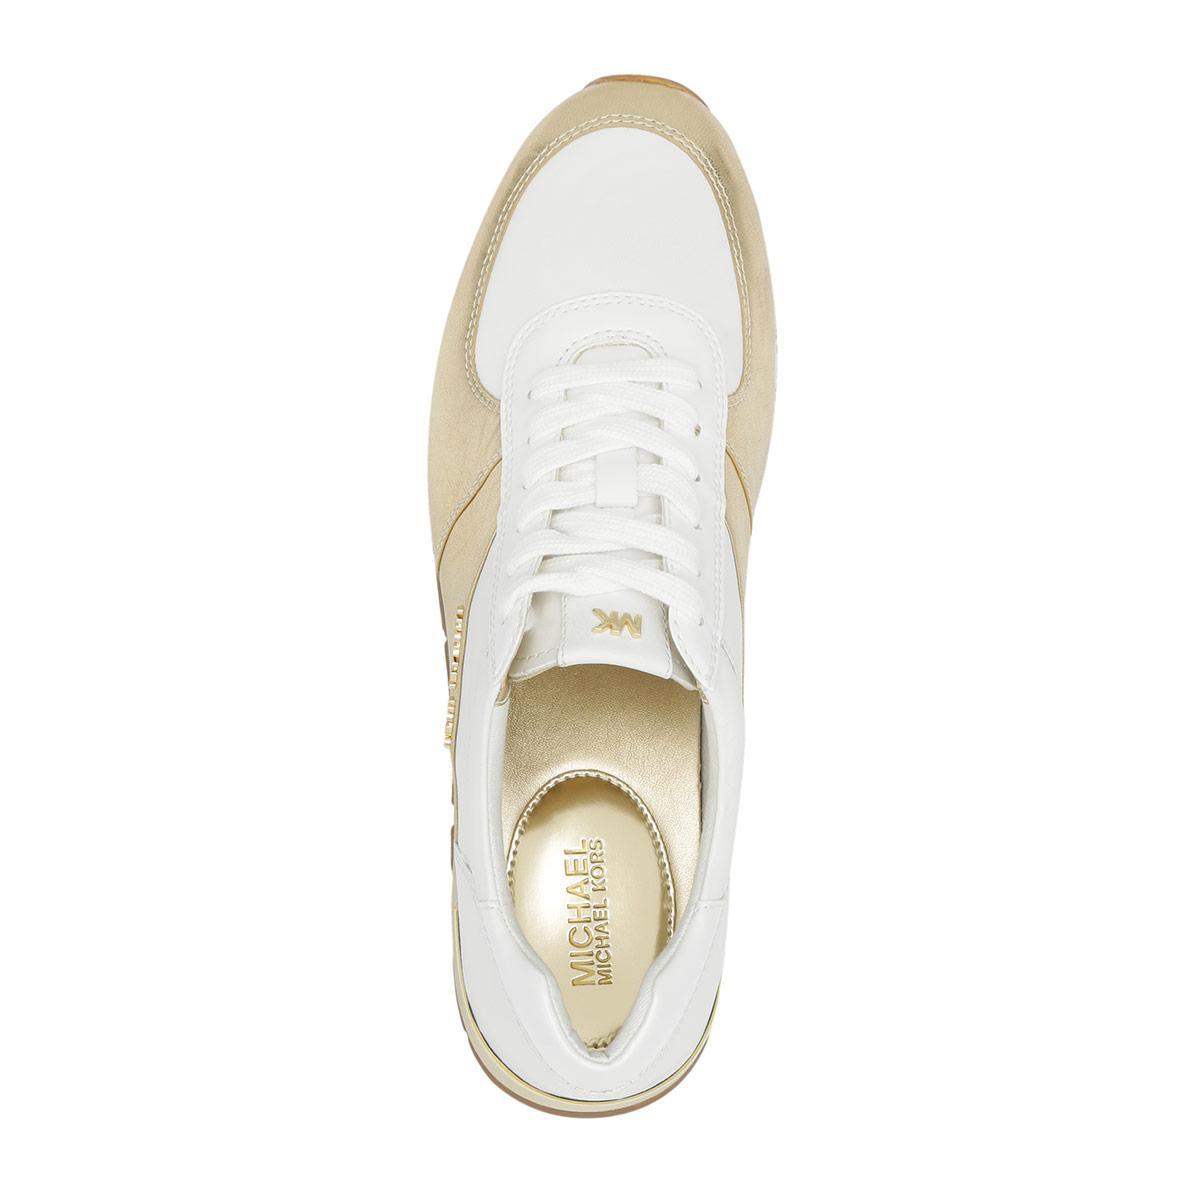 1c79ca0de1d4 Michael Kors Allie Wrap Trainer Sneaker Leather Pale Gold white in ...